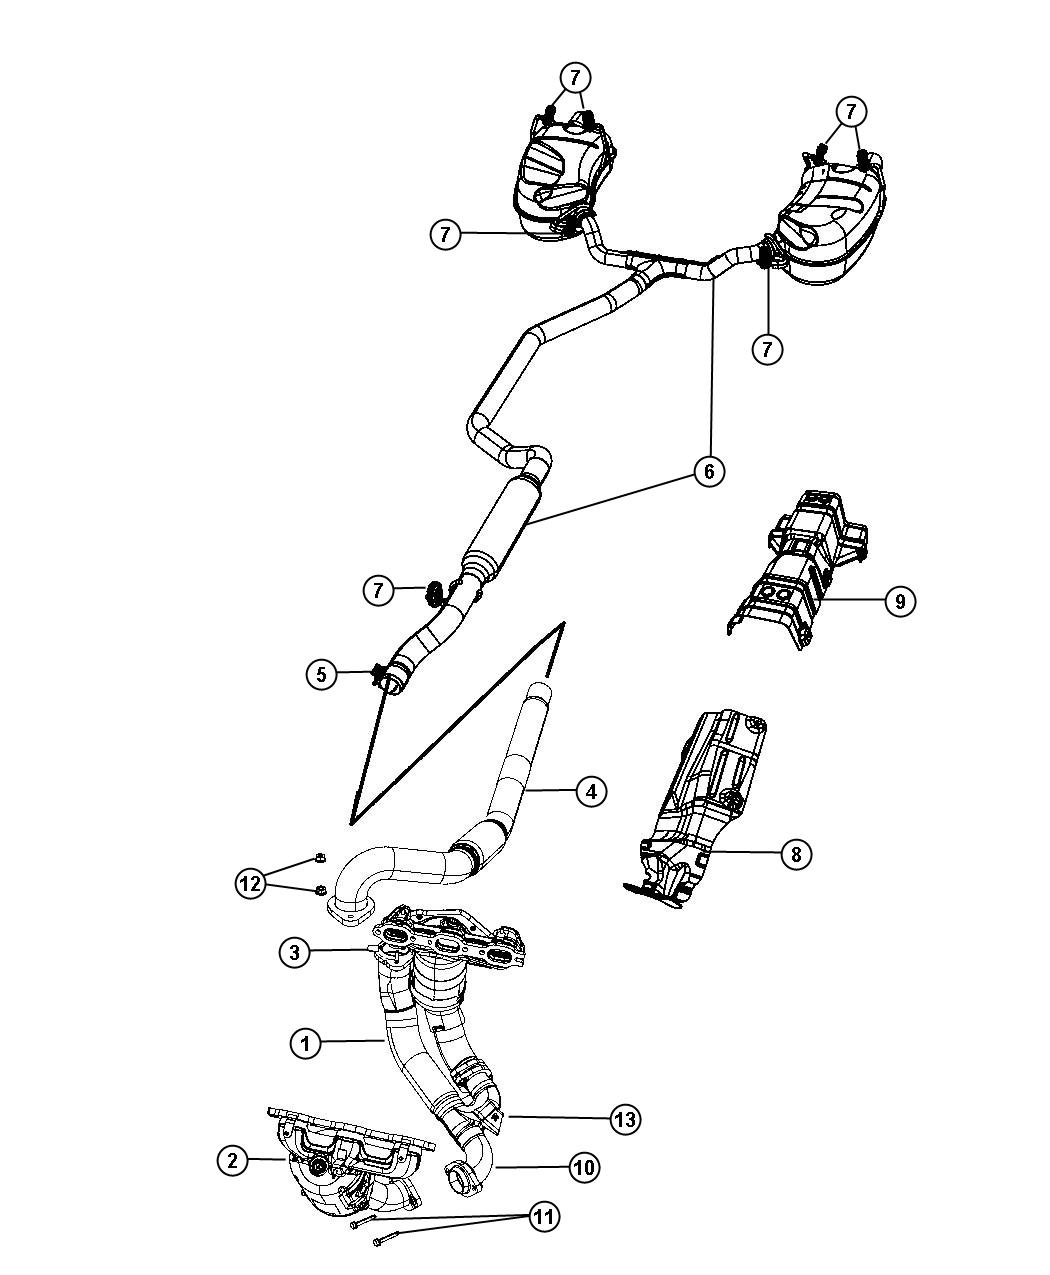 Dodge Journey Used for: MUFFLER AND RESONATOR. Exhaust